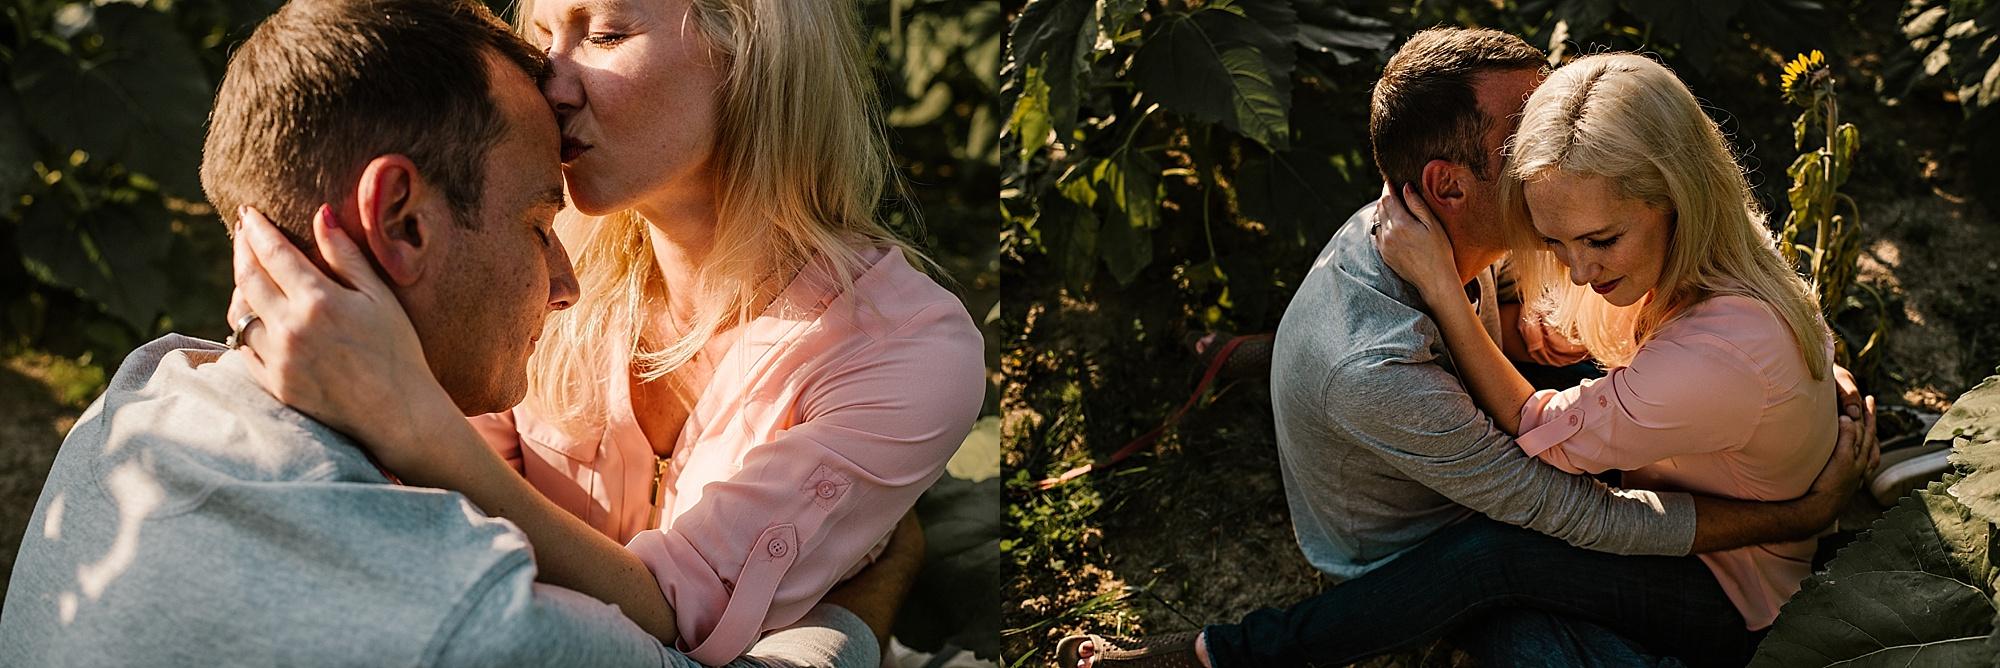 Lori-and-mike-akron-ohio-photographer-lauren-grayson-sunflower-field-session_0017.jpg